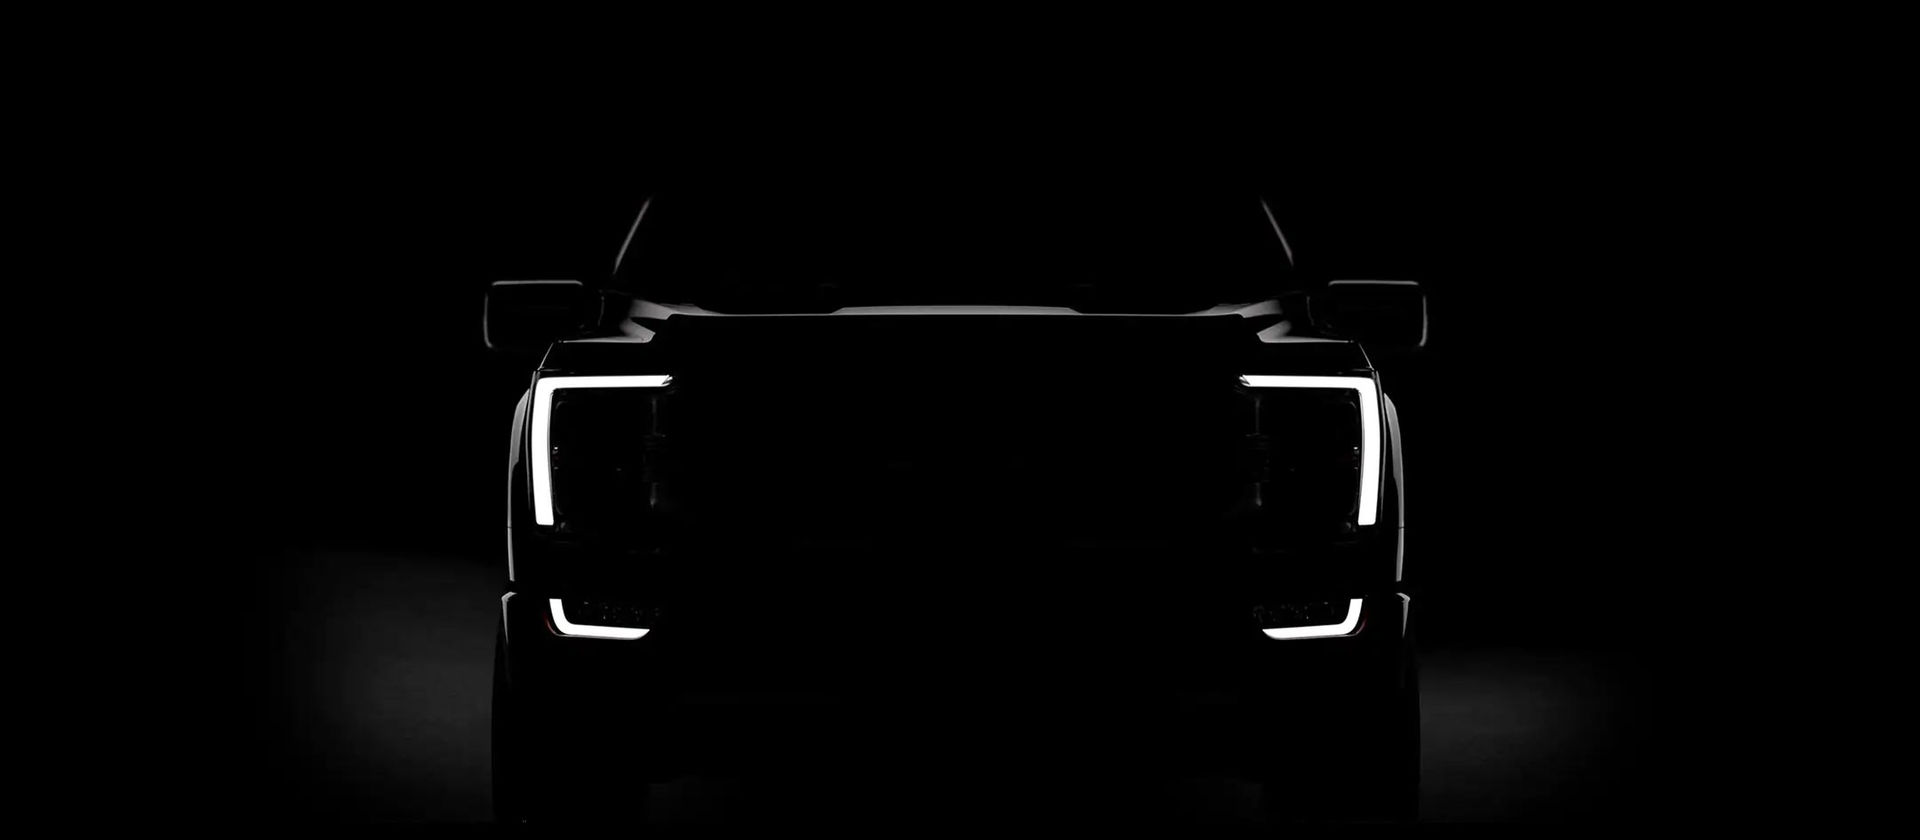 Teaserbild på Ford F-150:s nya ansikte